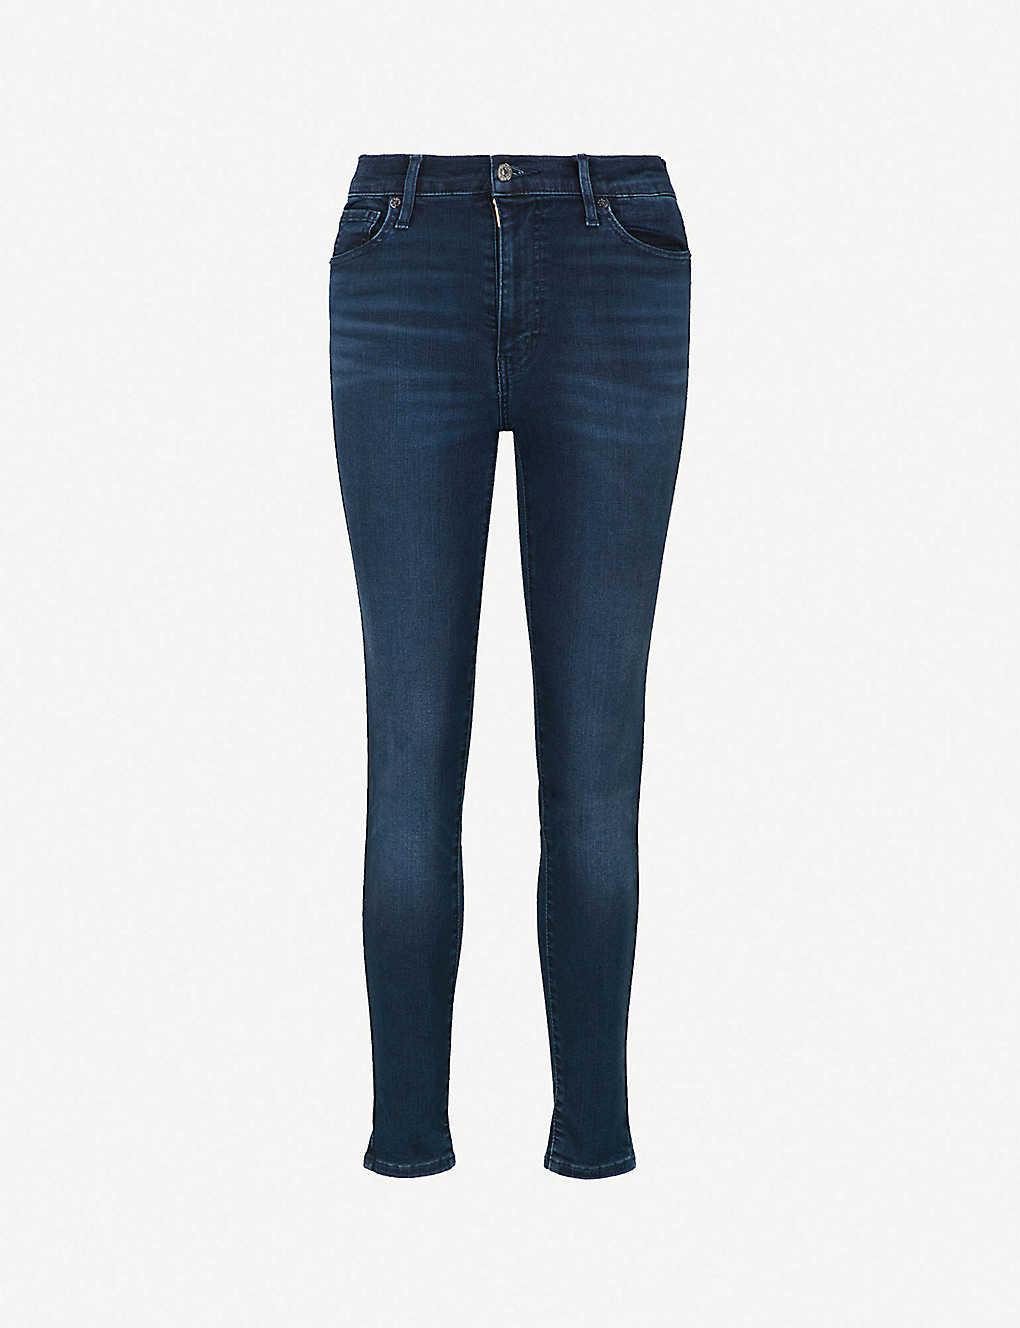 LEVI S - Mile High super-skinny high-rise jeans  5acc6236a